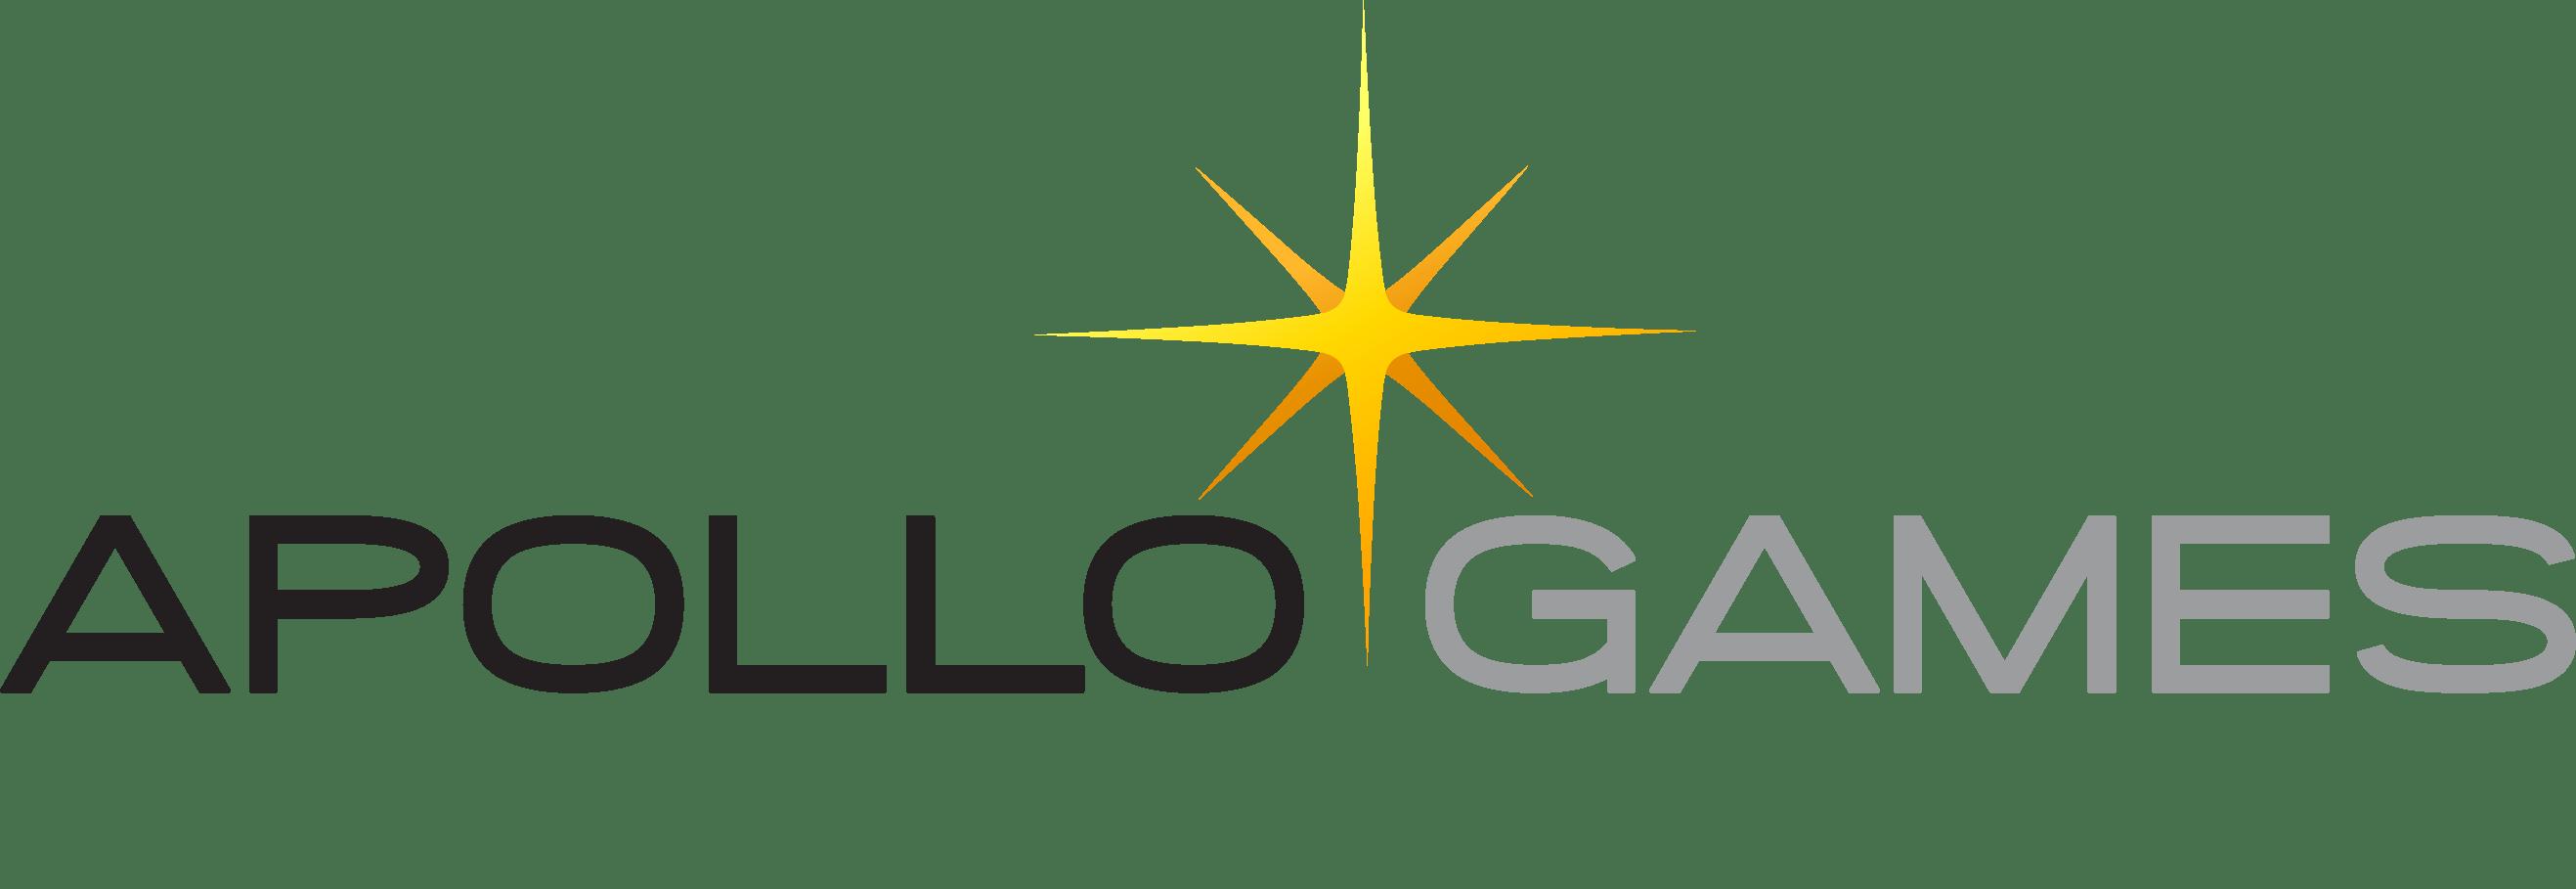 Apollo Games गेम्स